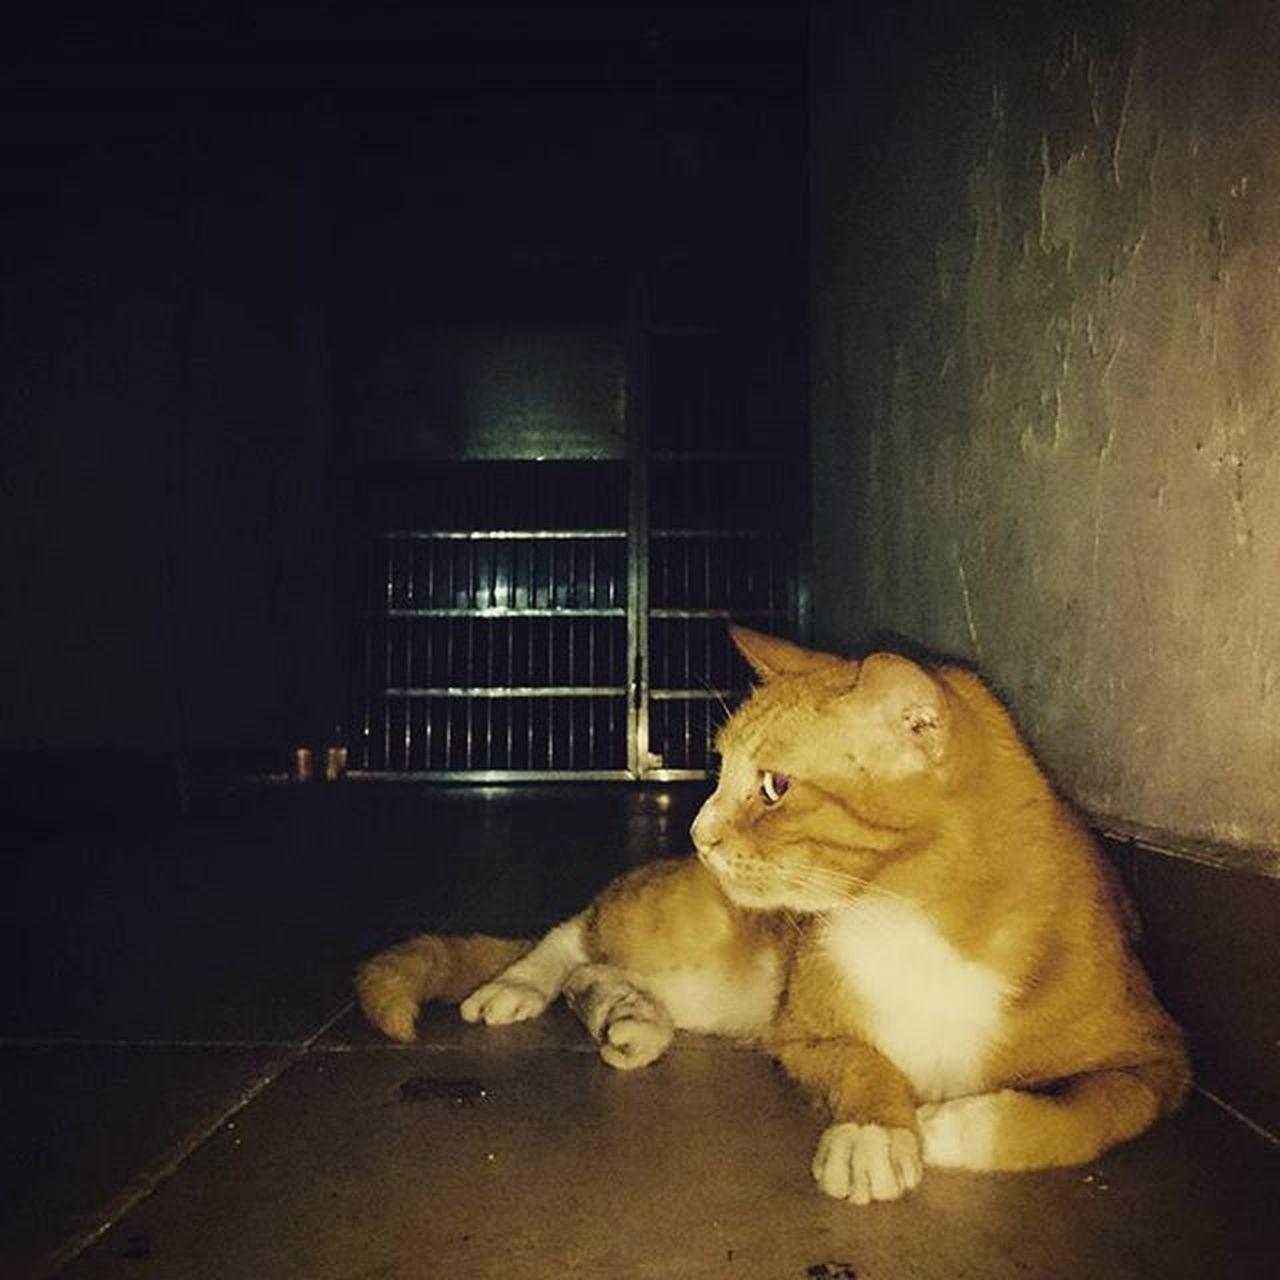 pets, one animal, animal themes, domestic animals, night, no people, sitting, mammal, indoors, dog, domestic cat